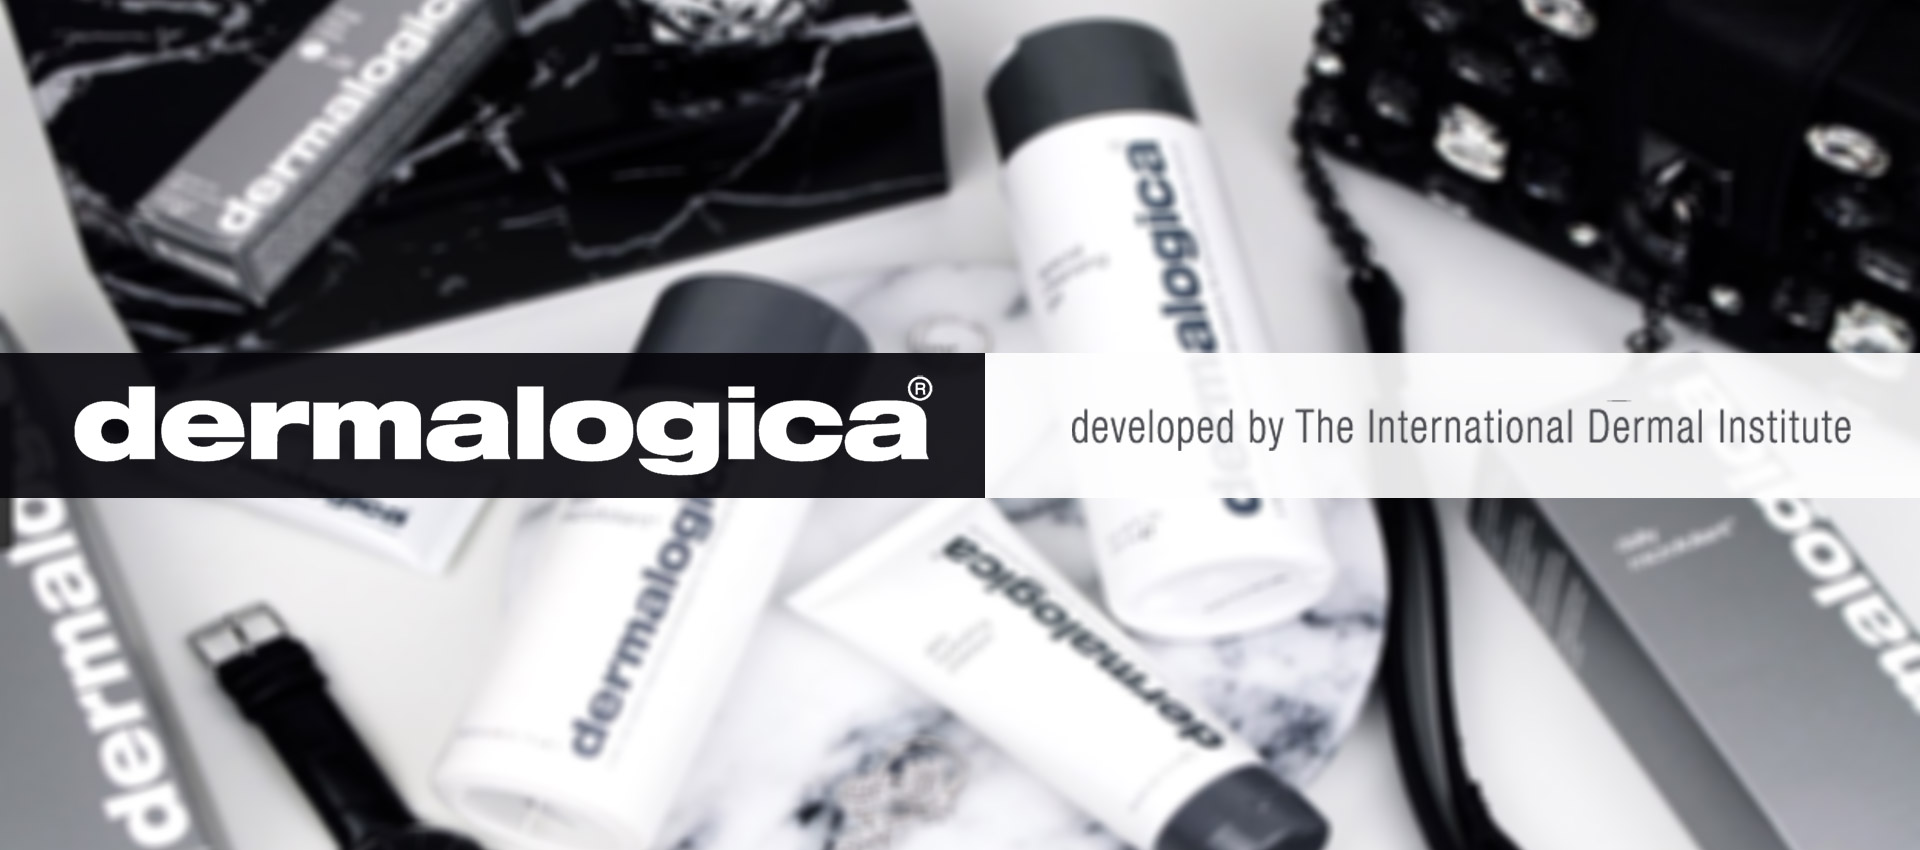 dermalogica-new-banner.jpg